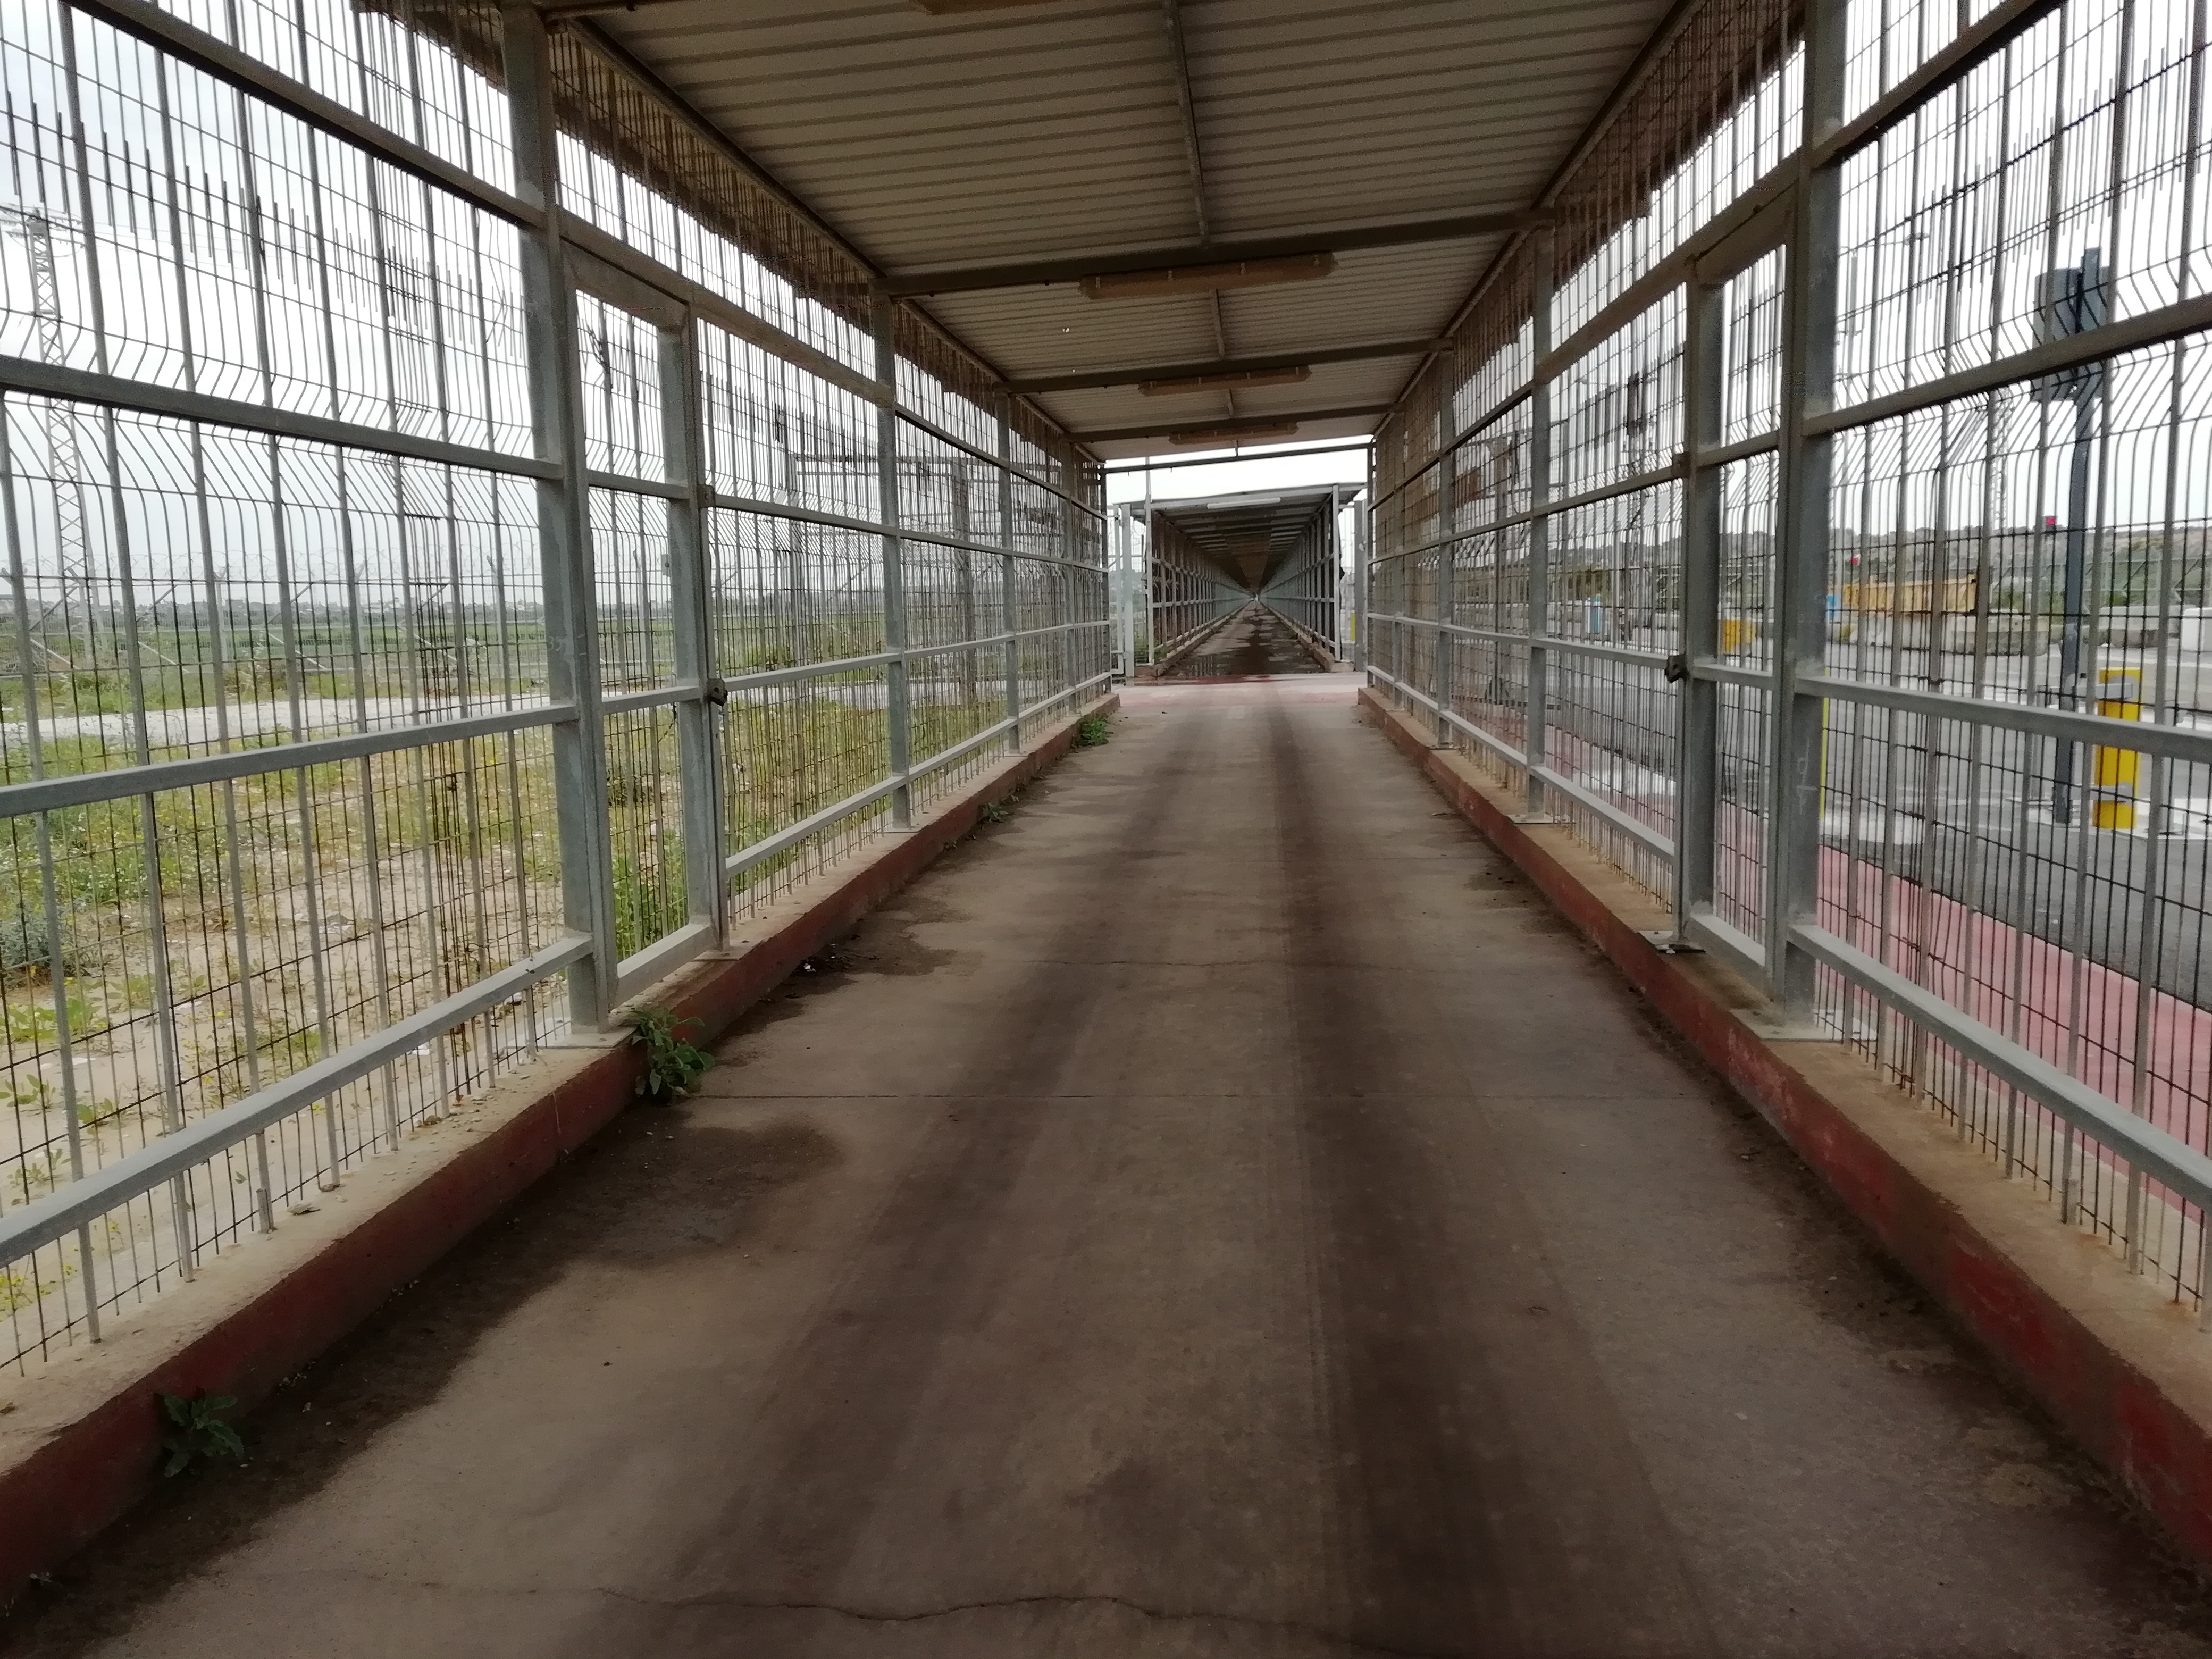 swingerclub karree mischmasch getränk kroatien